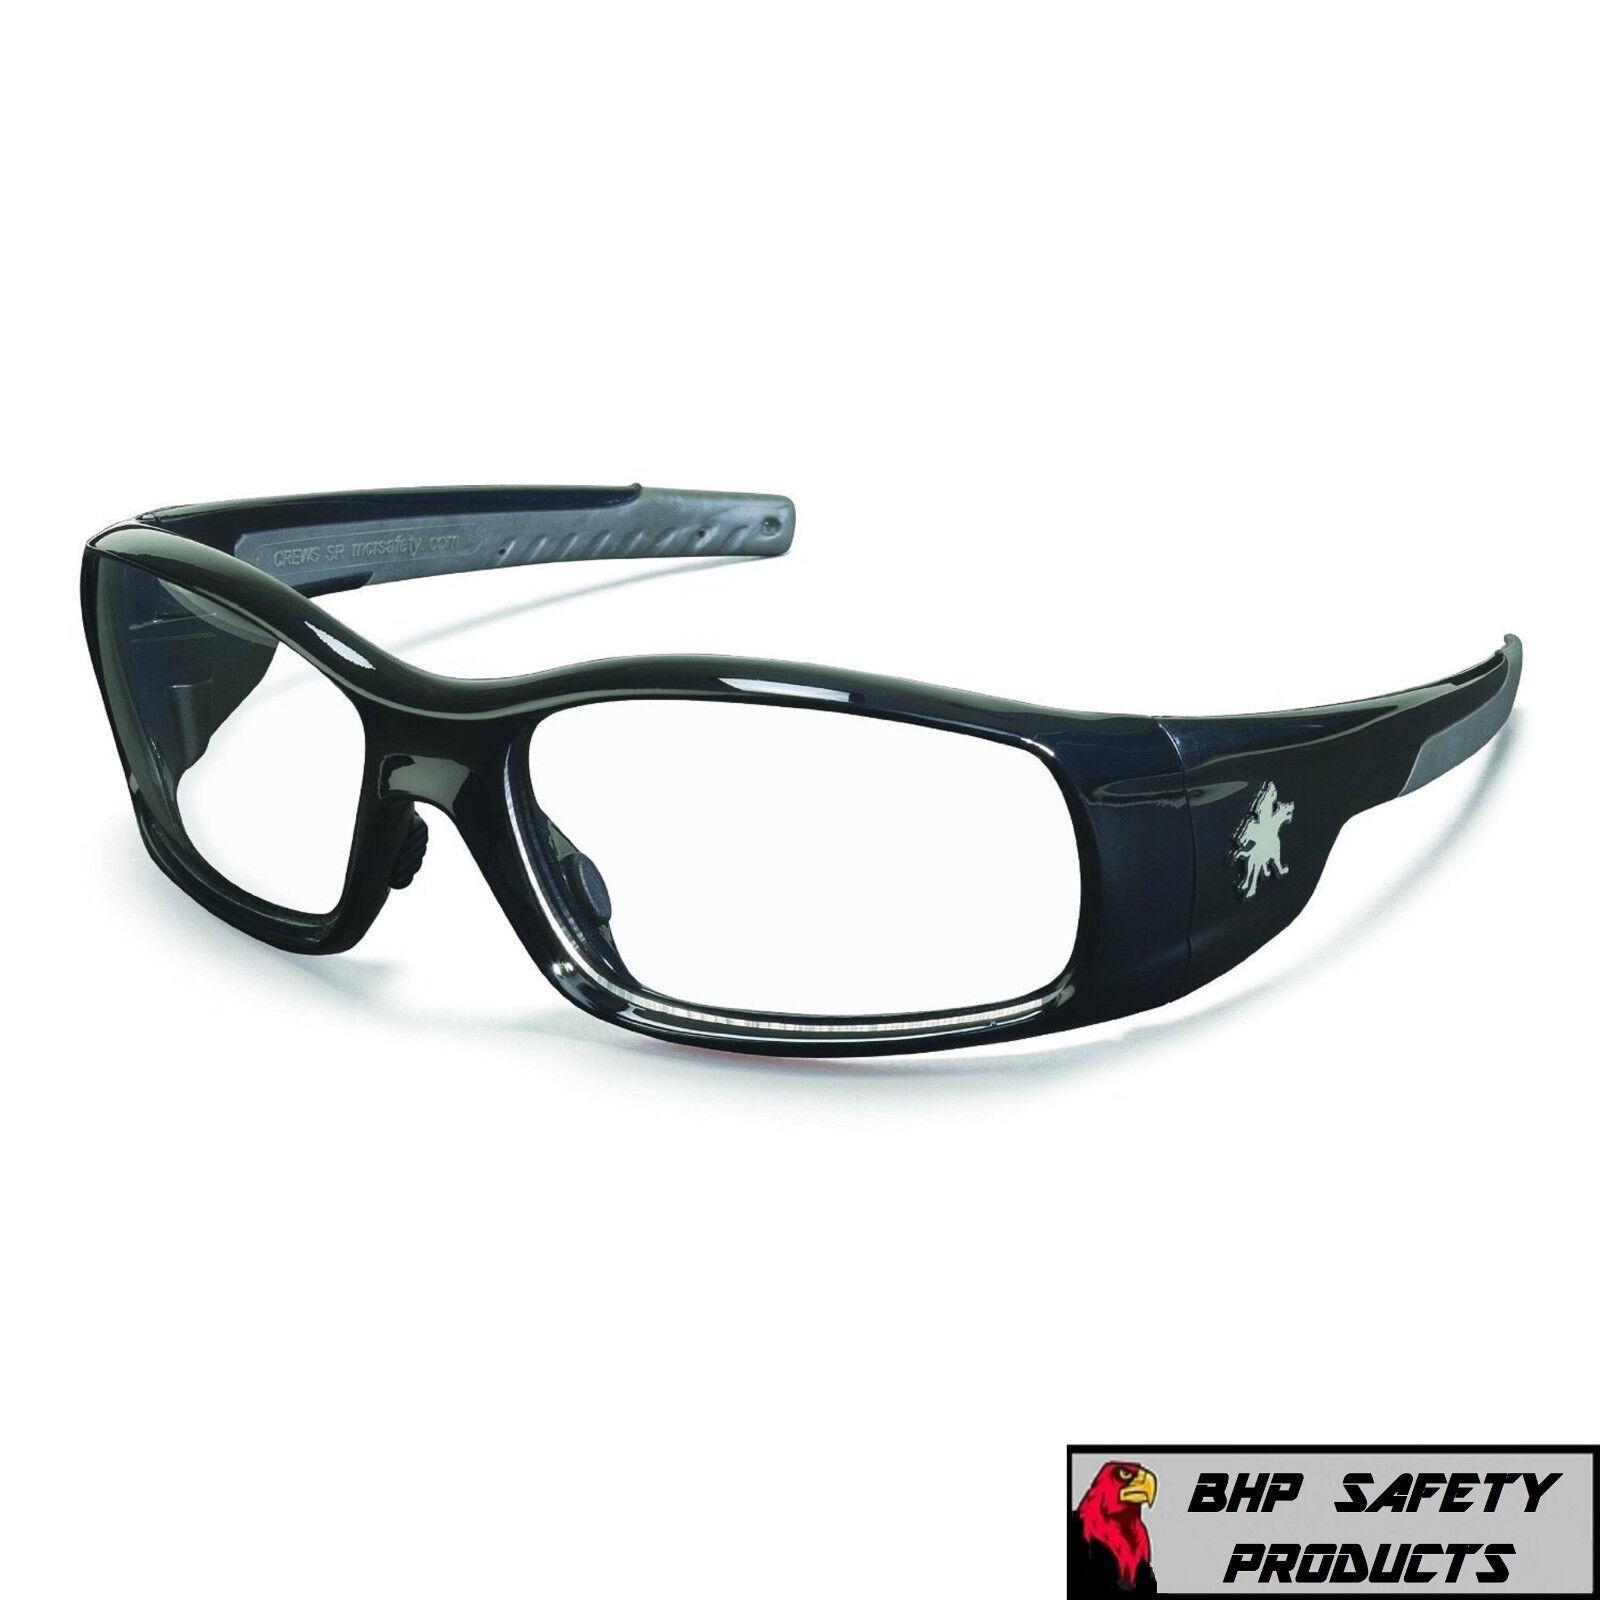 MCR CREWS SWAGGER SAFETY GLASSES SUNGLASSES WORK SPORT EYEWEAR CHOOSE YOUR COLOR SR110 CLEAR LENS/BLACK FRAME